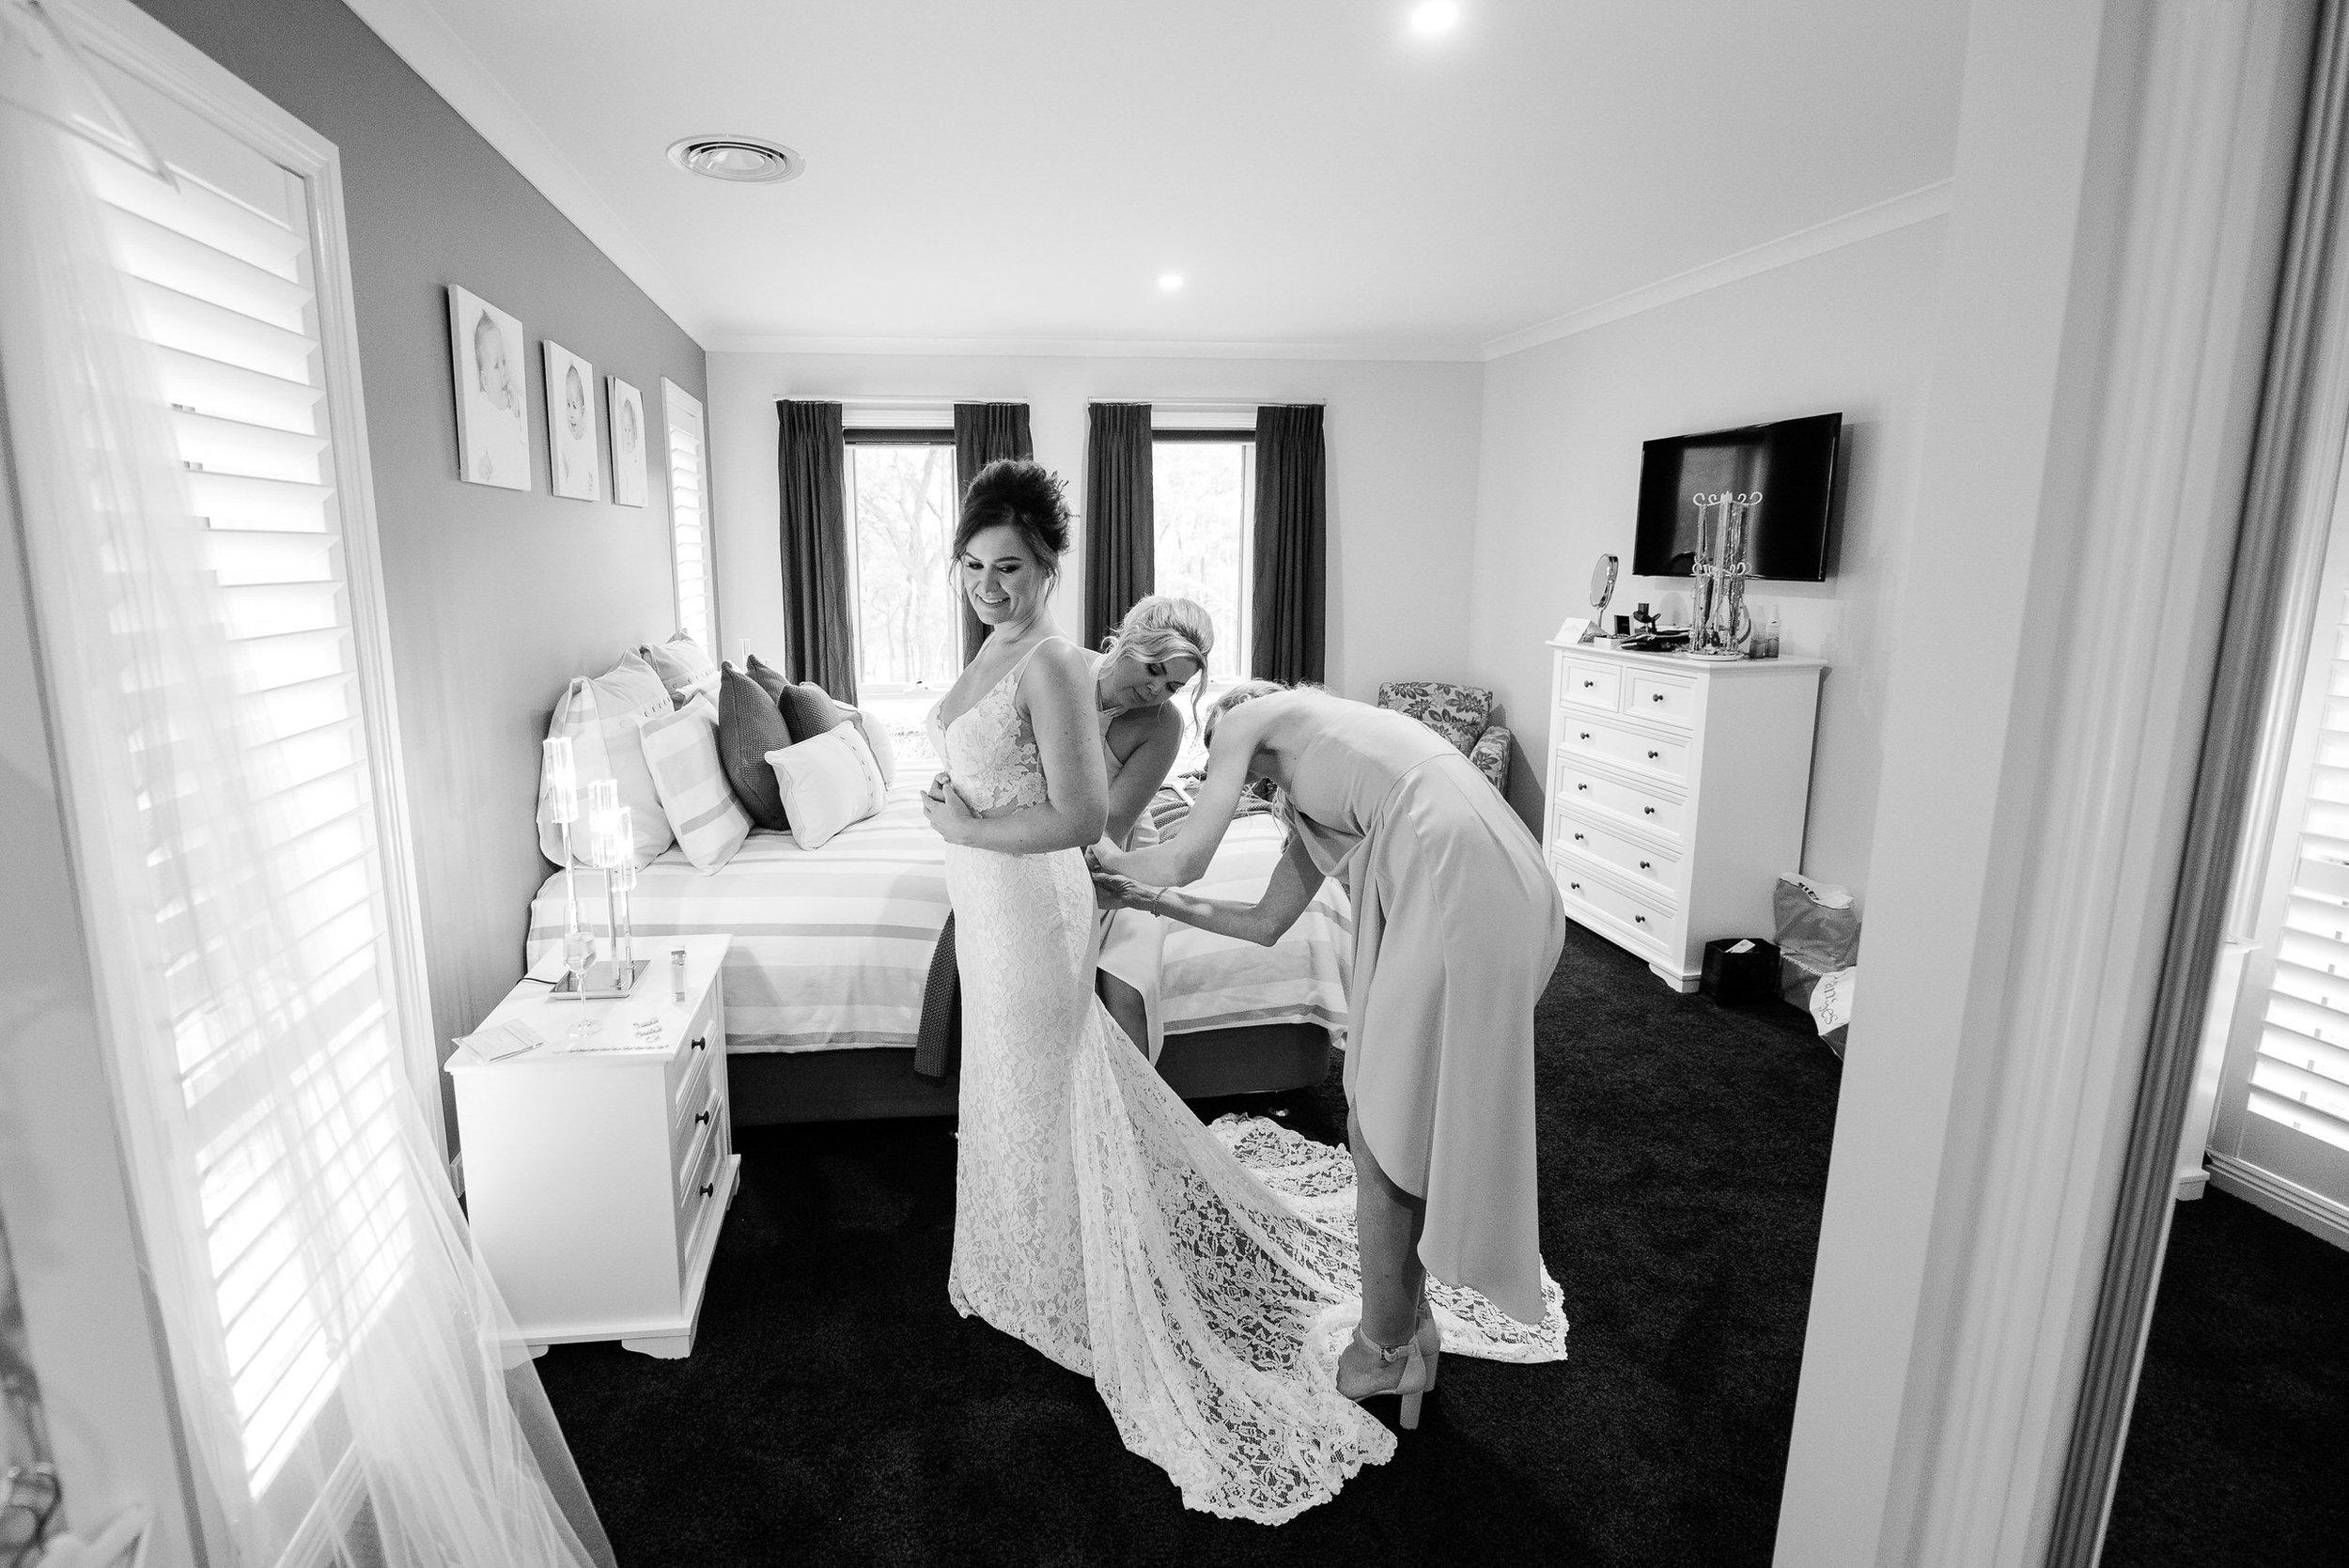 Justin_And_Jim_Photography_Chateau_Dore_Bendigo_Wedding20.JPG